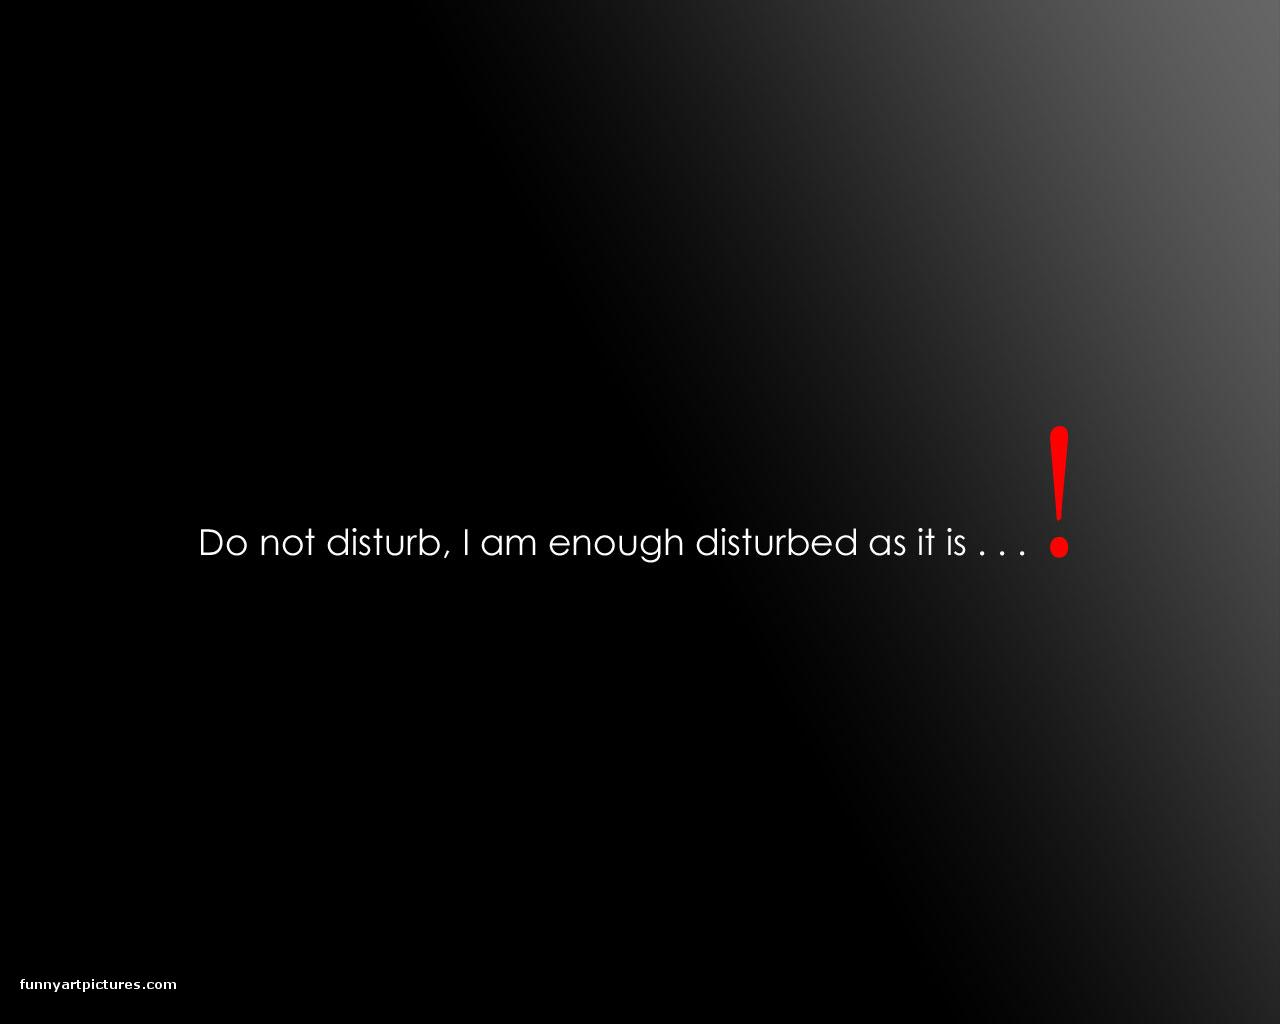 Desktop Funny humorous Wallpaper computer screensaver background 1280x1024